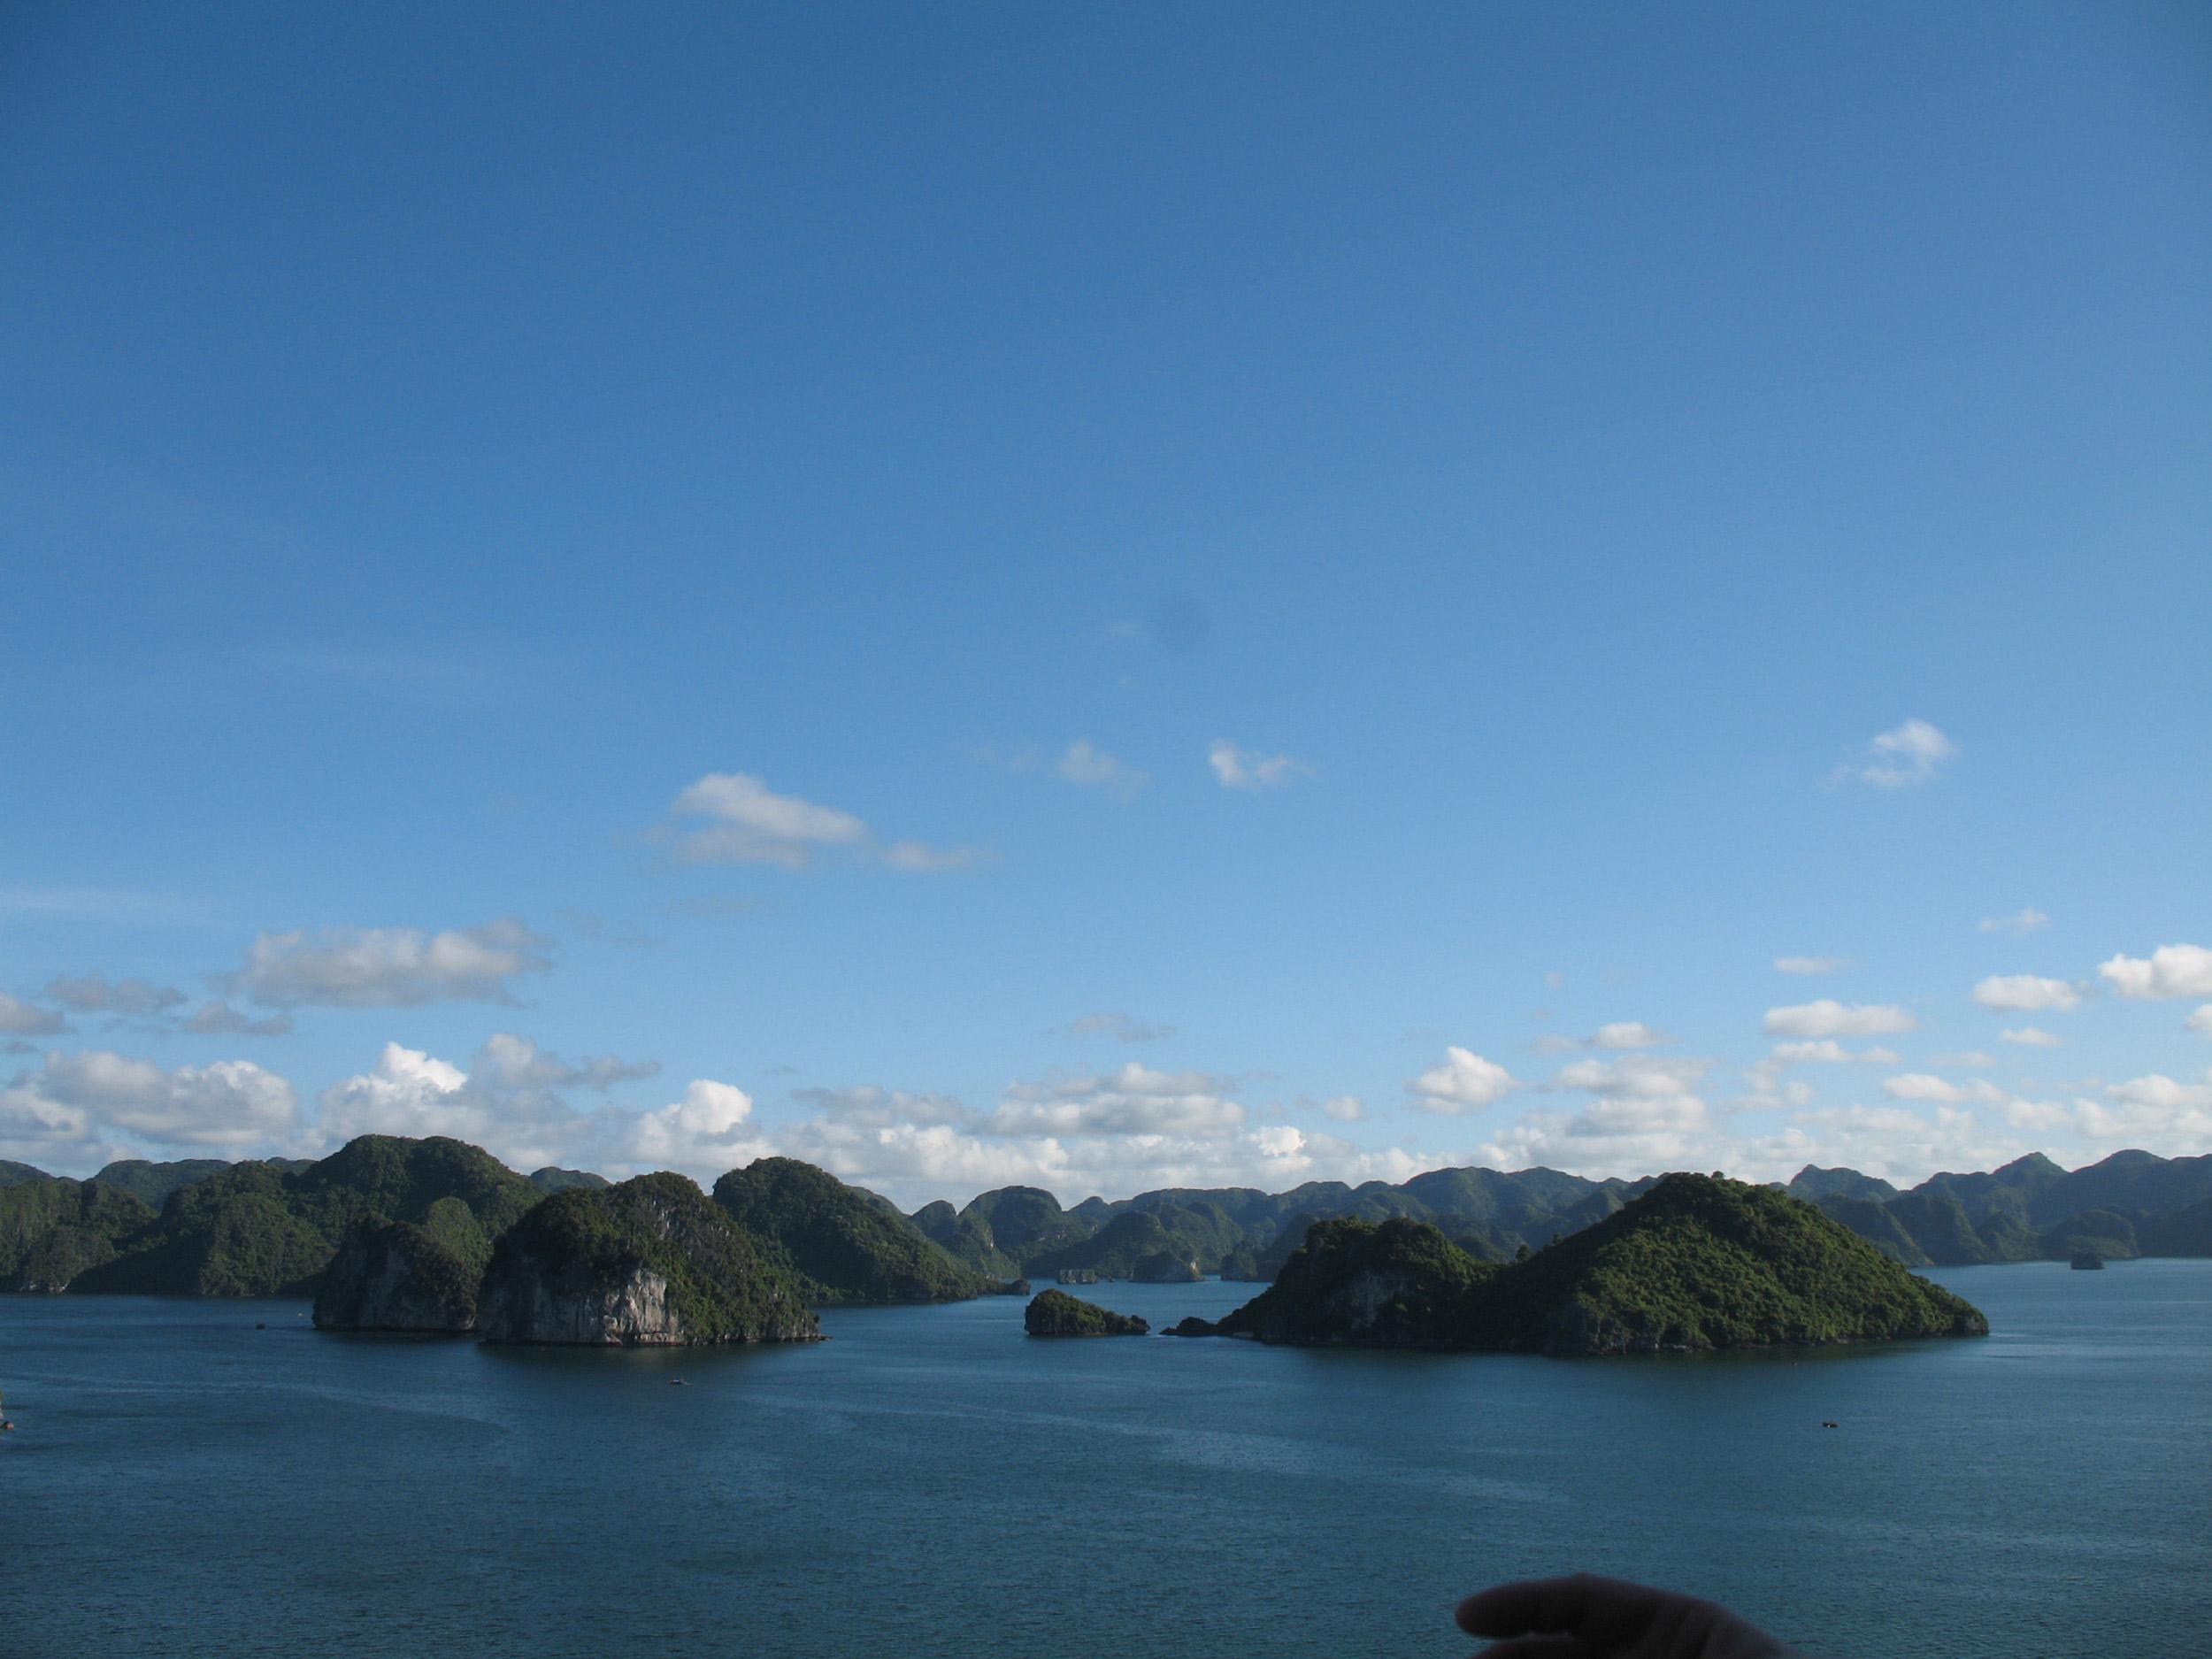 halong-bay-scenery-high.jpg